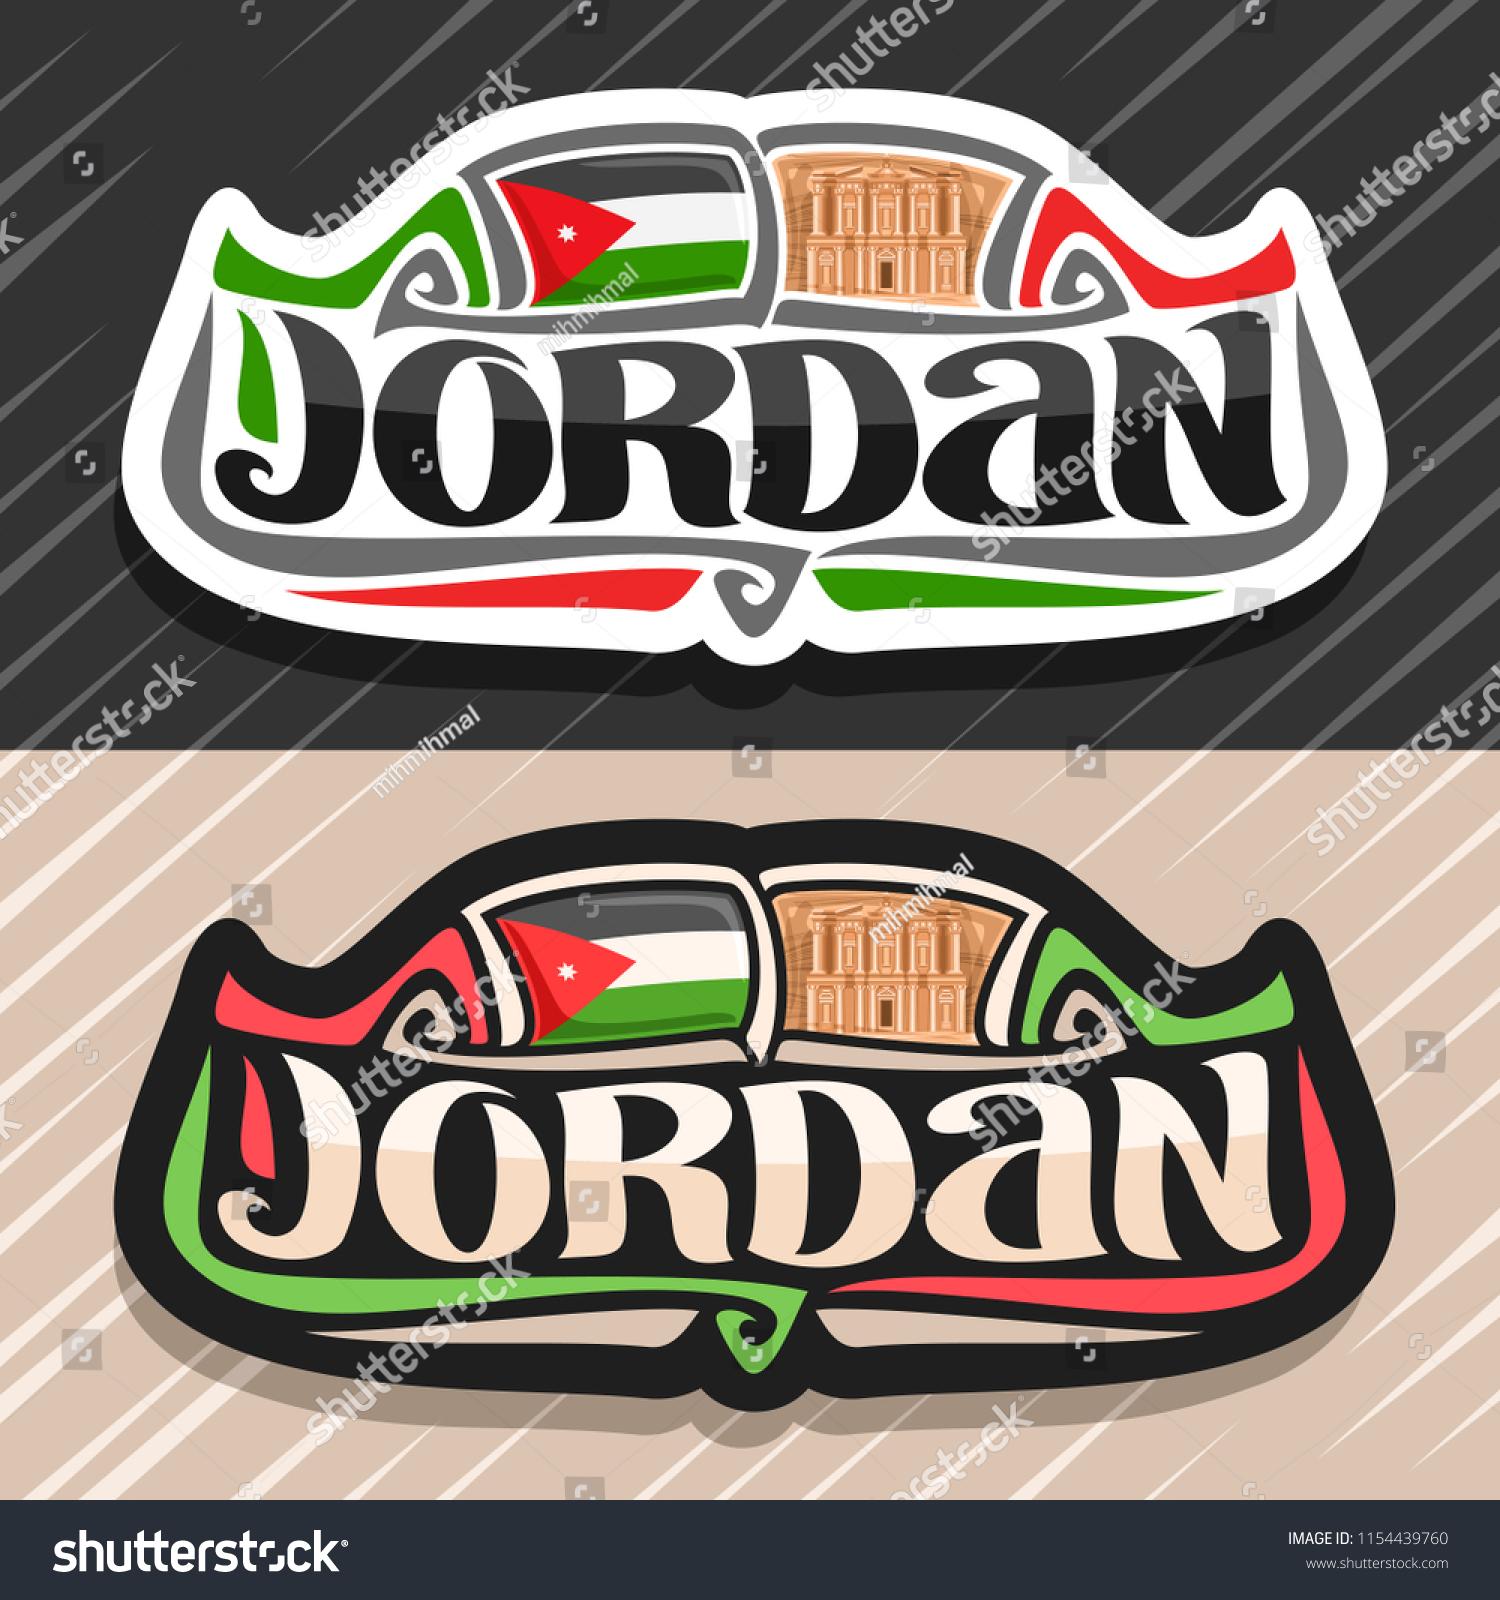 Vector logo for jordan country fridge magnet with jordanian state flag original brush typeface